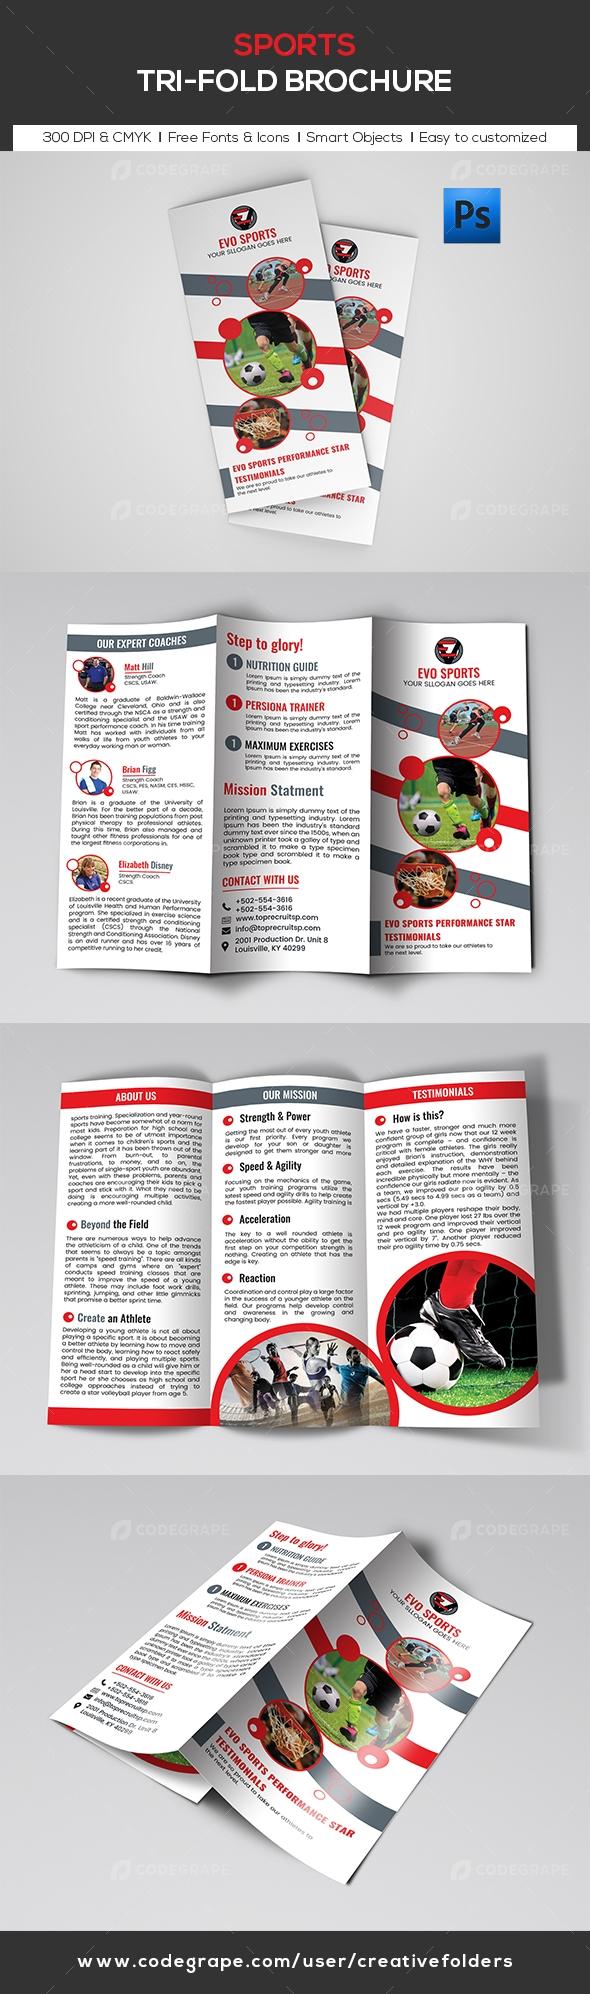 Sports Trifold Brochure